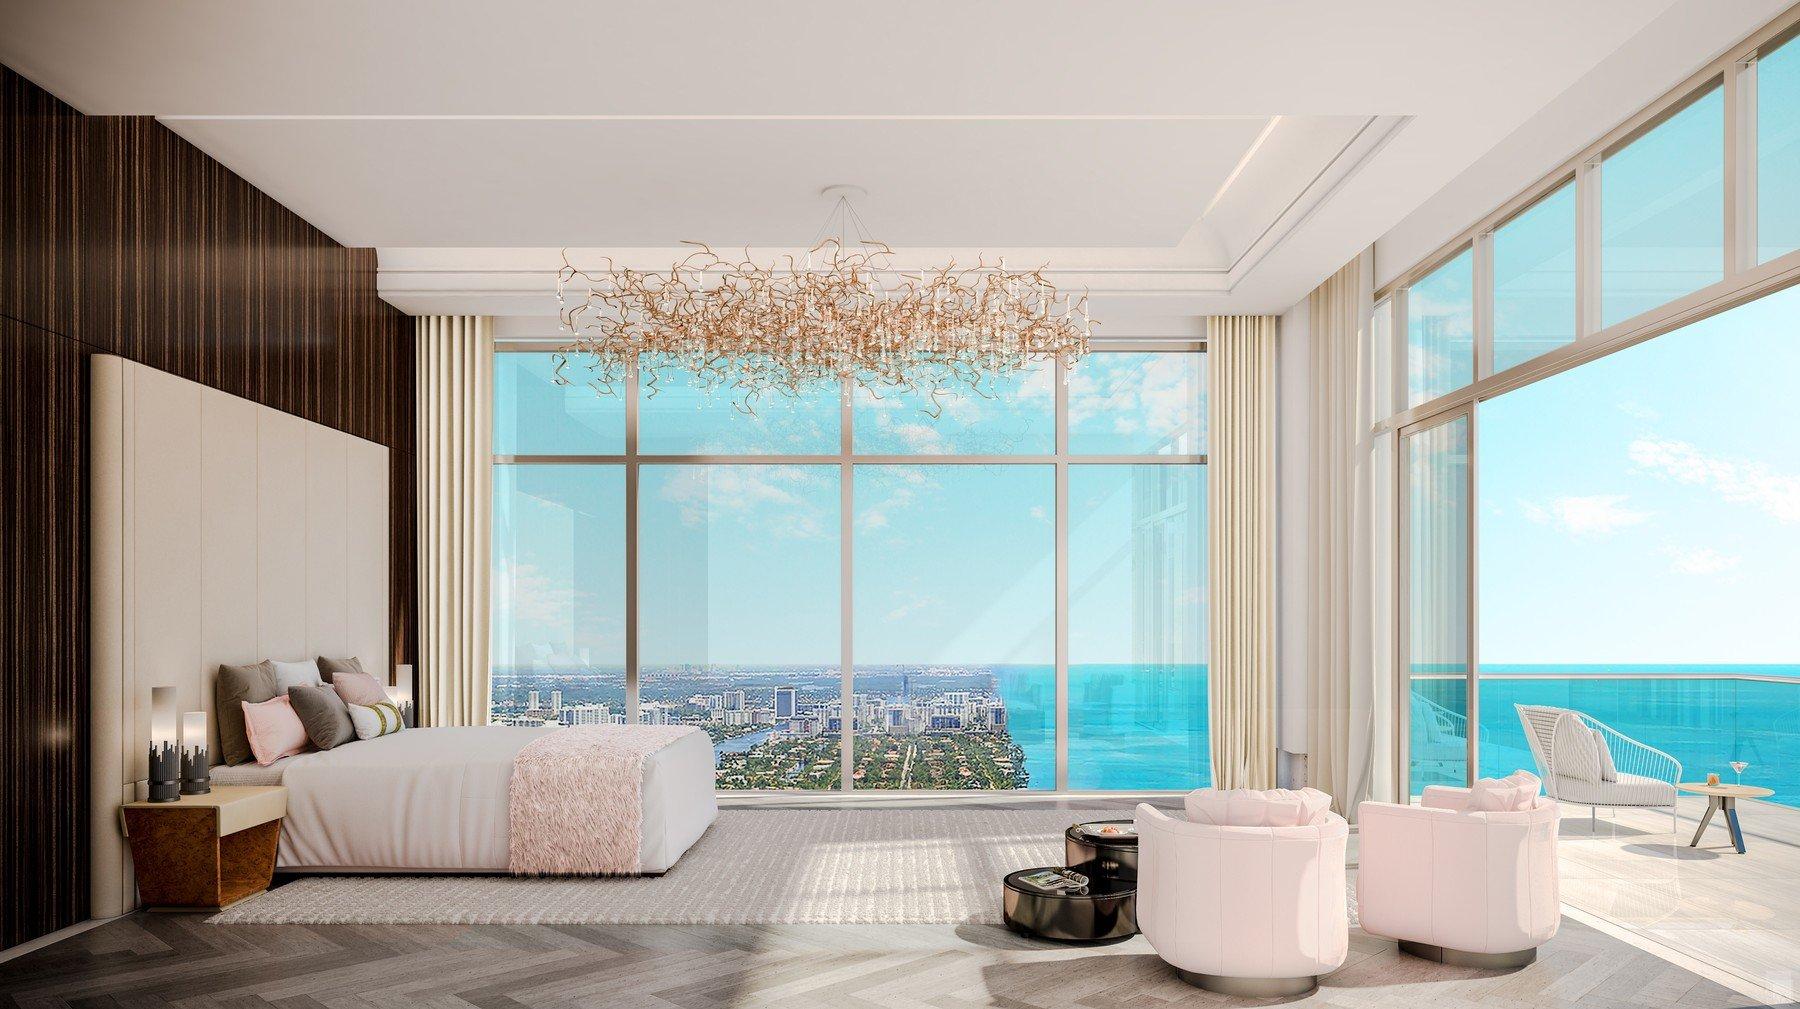 Luksuzni penthouse u Miamiju, ilustracija